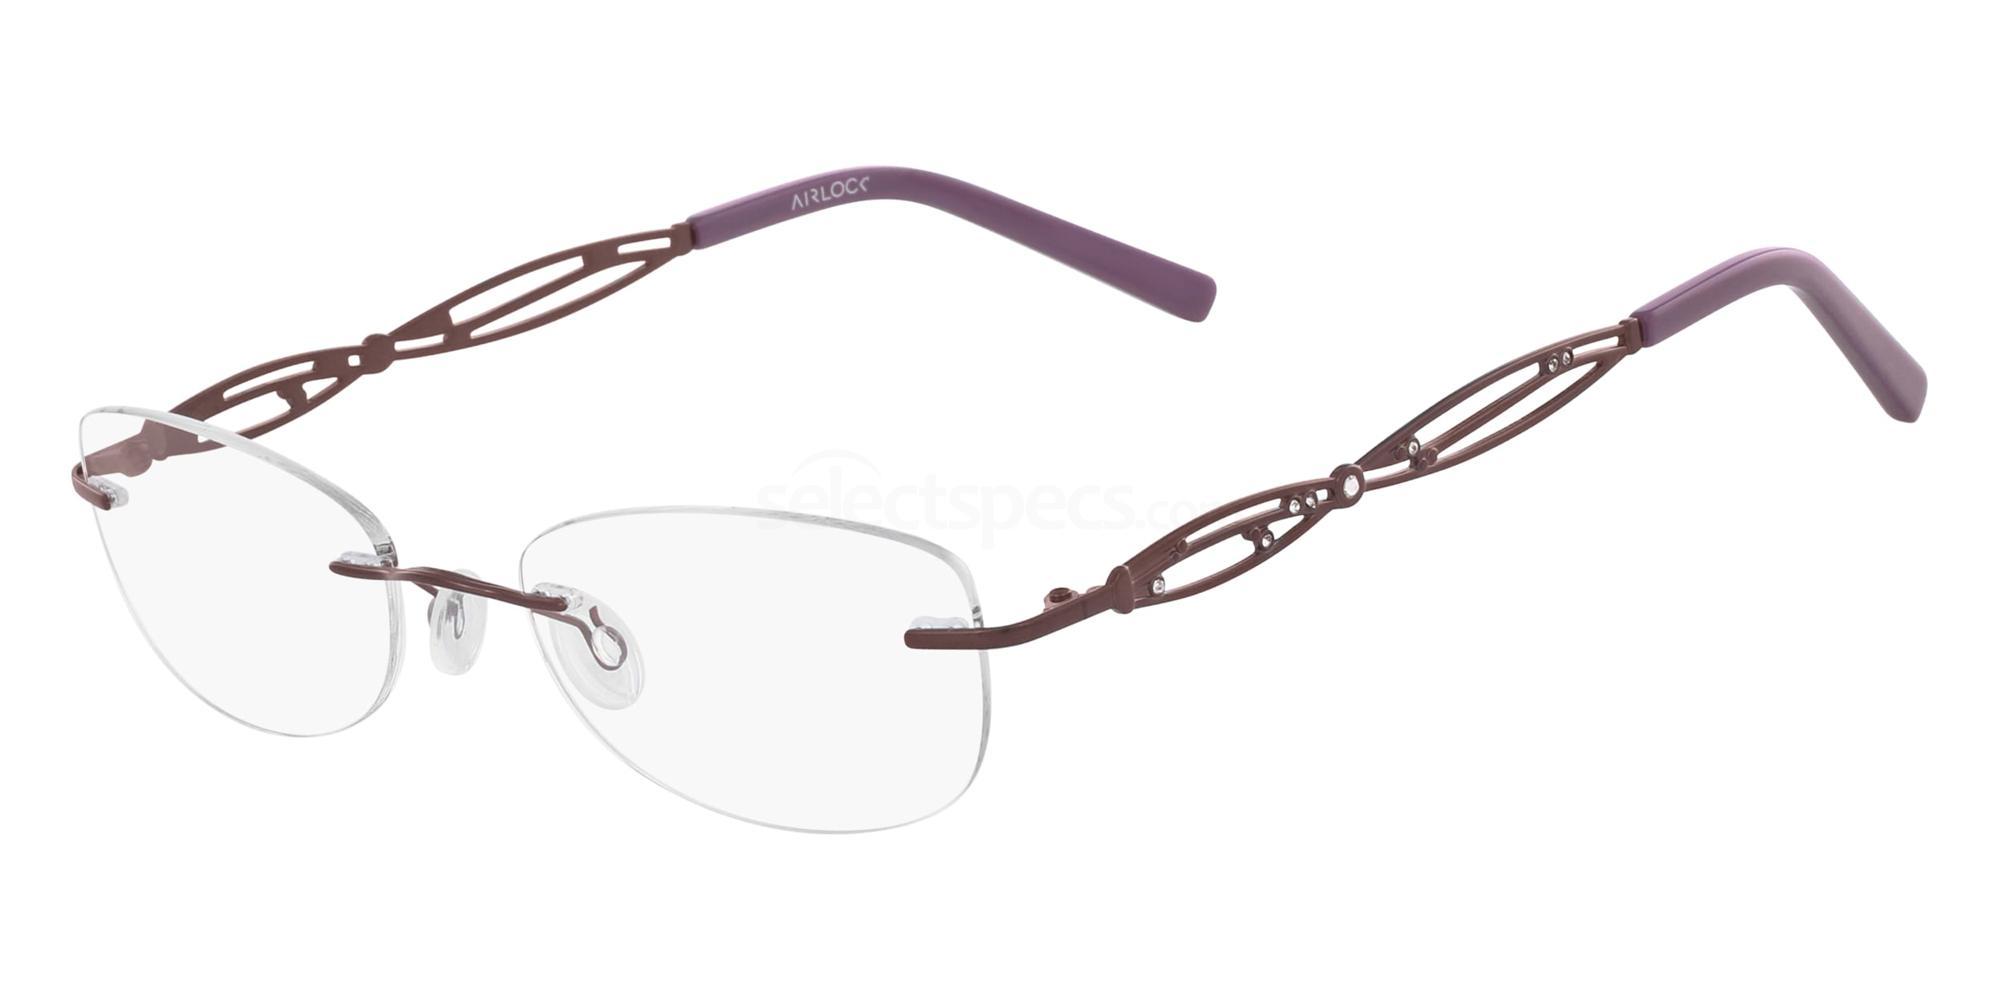 505 ENCHANTMENT 202 Glasses, AIRLOCK